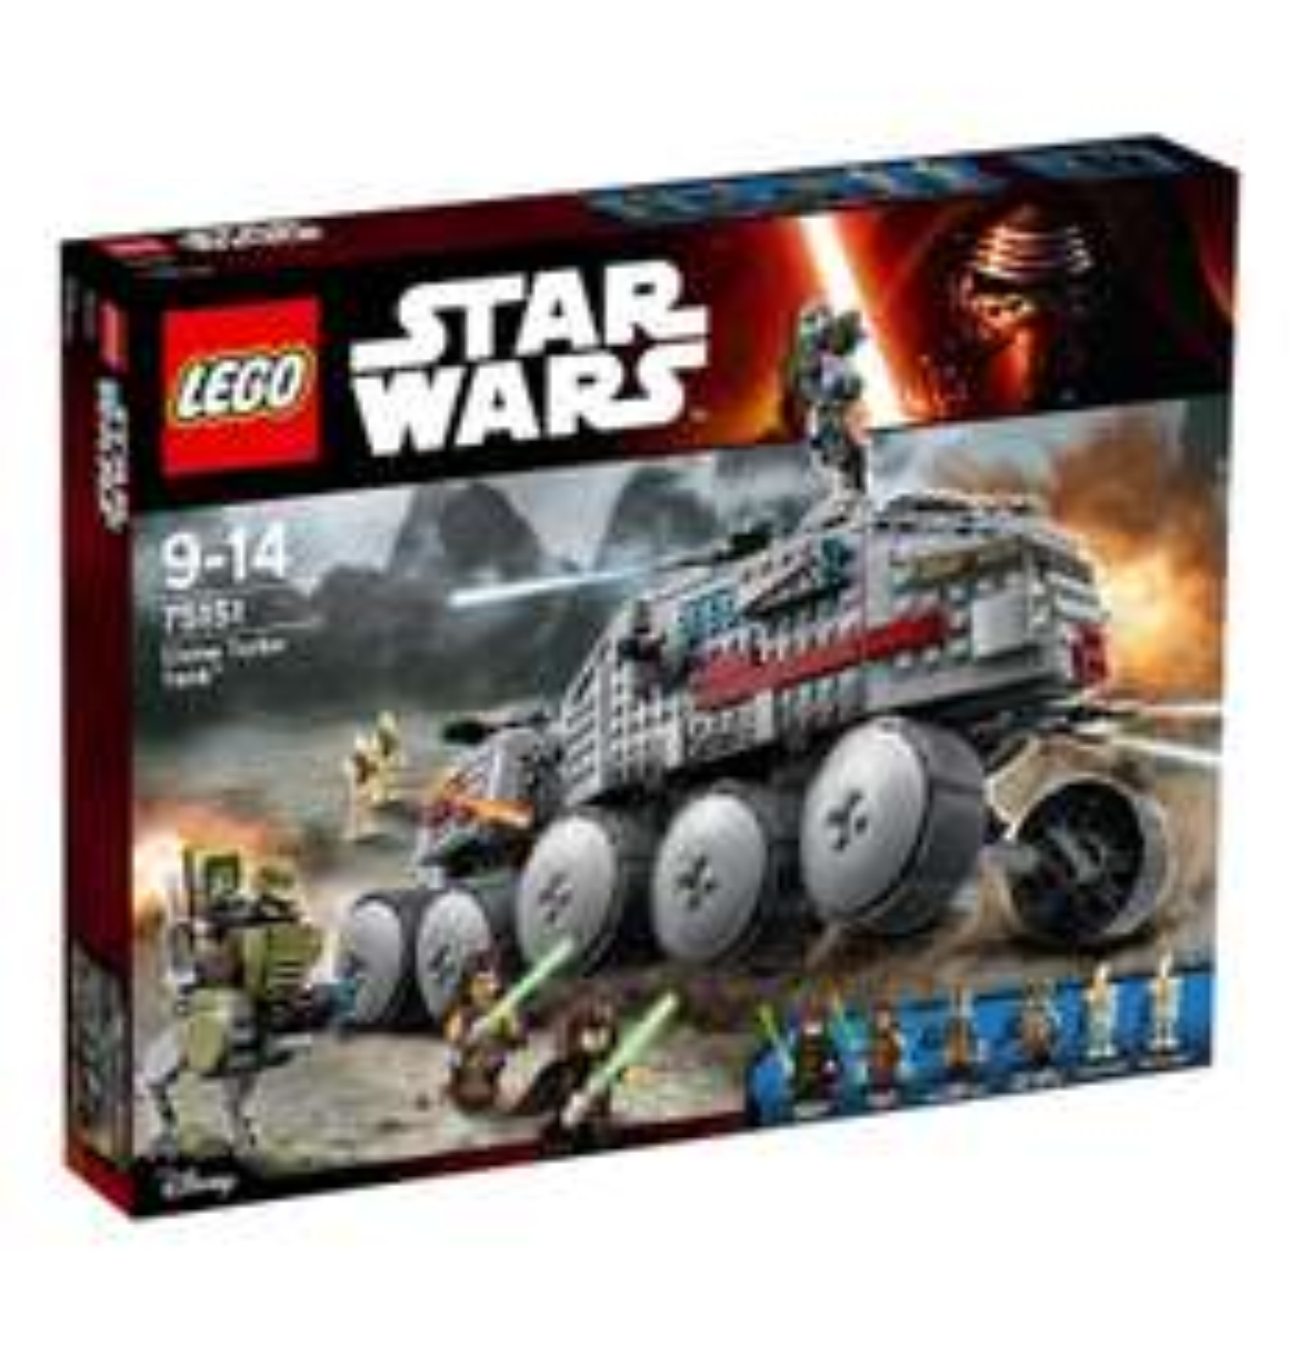 (Galeria Kaufhof Online) - Lego Star Wars Clone Turbo Tank